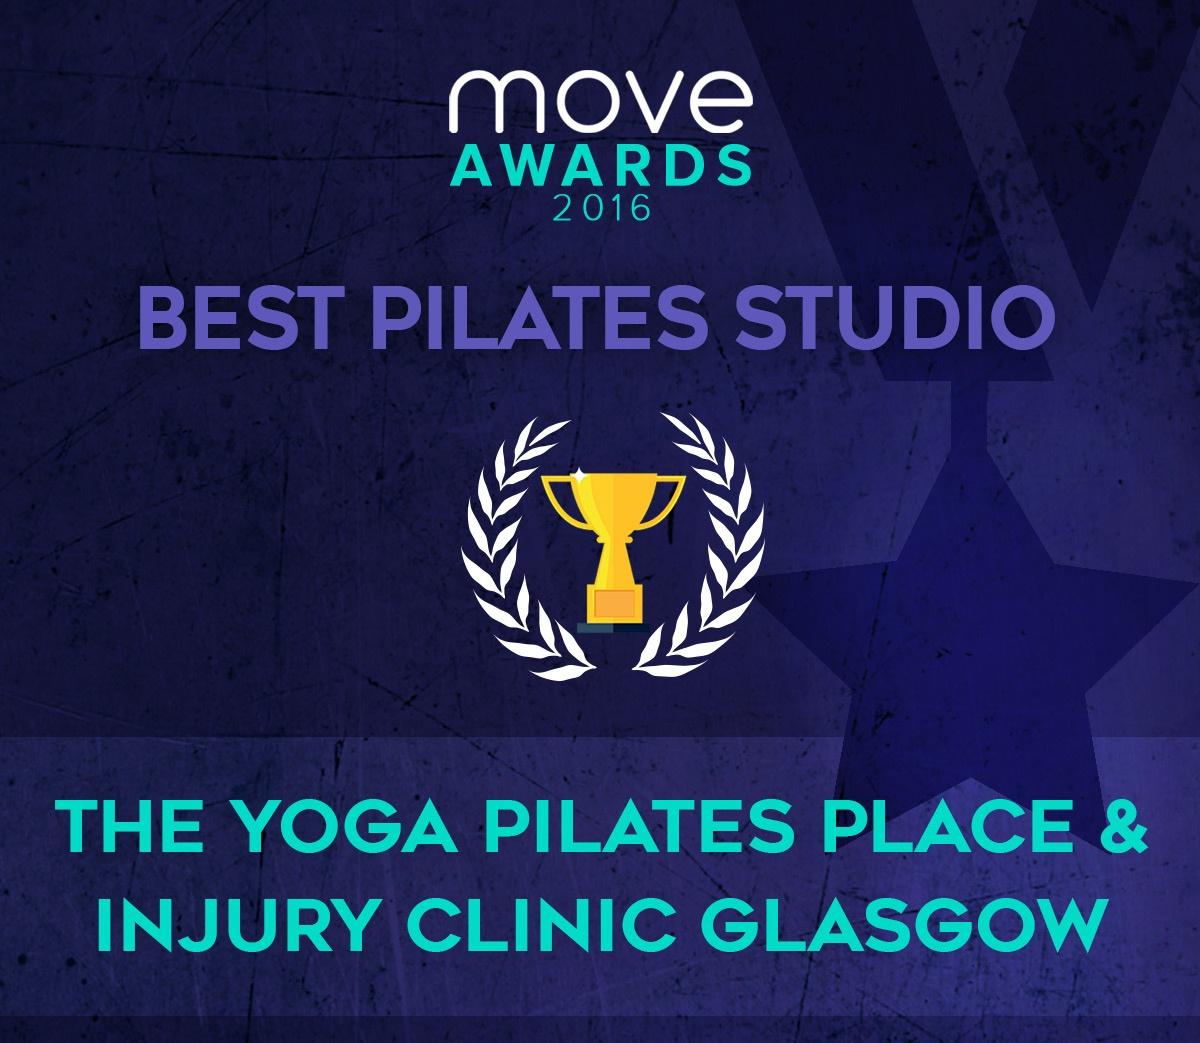 Best-Pilates-Studio-Glasgow.jpg